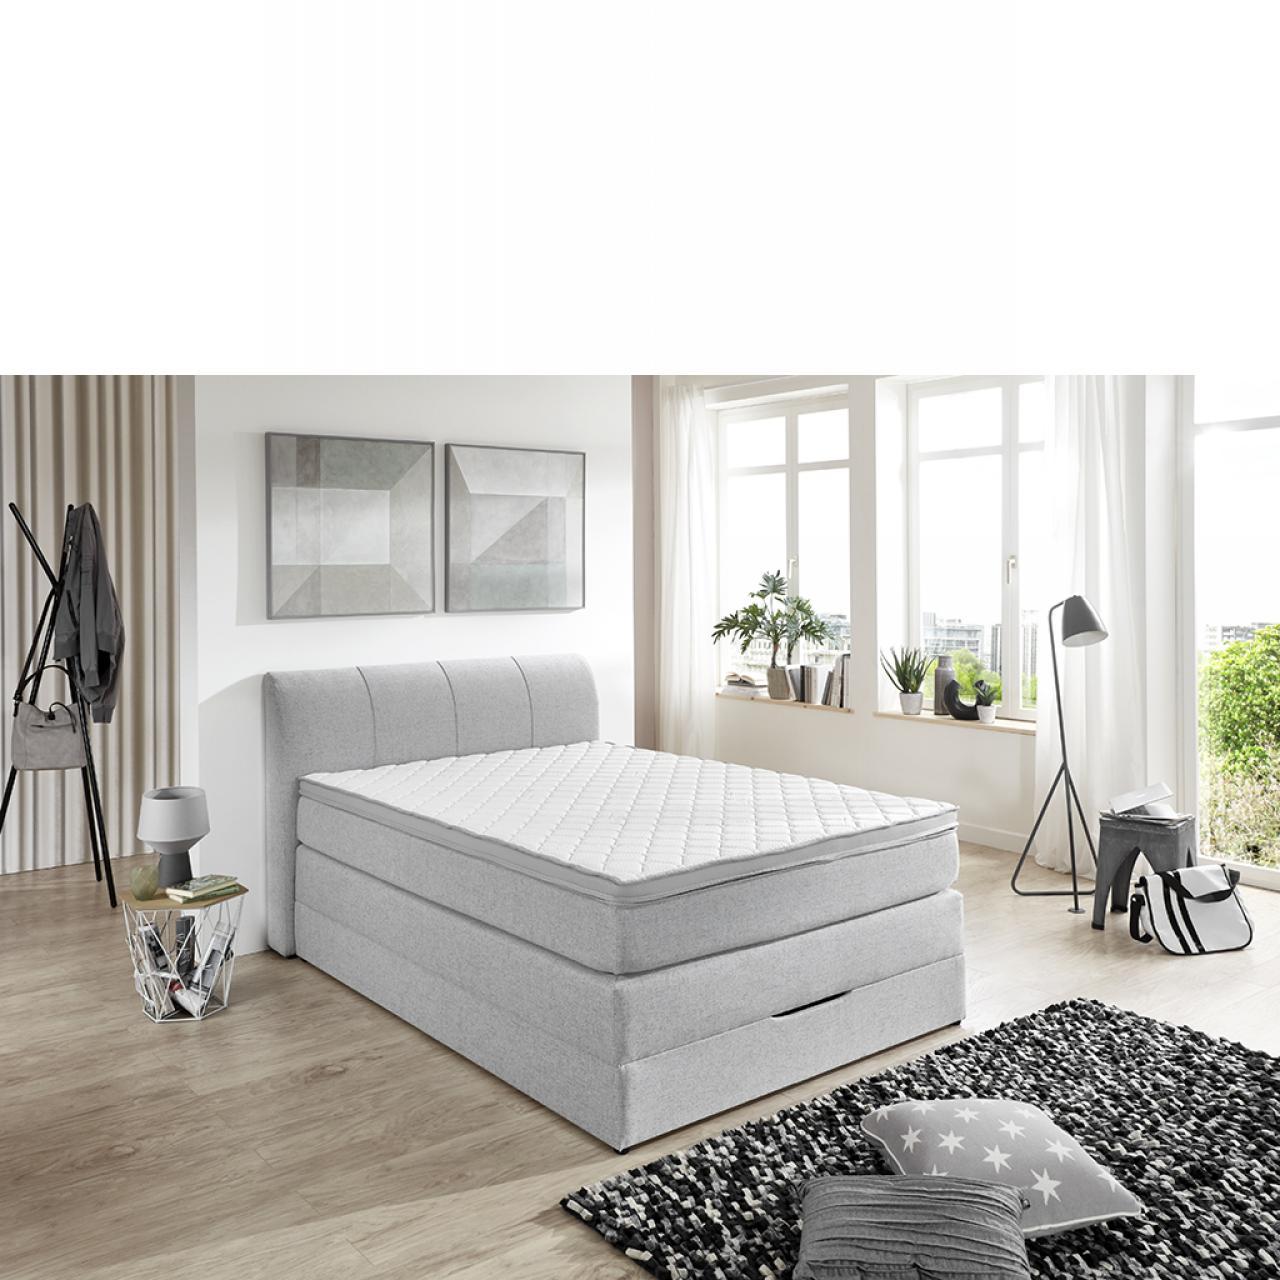 Boxspring-Set BX 1440 Mit Bettkasten Silver 100x200 Hotelbett Bett